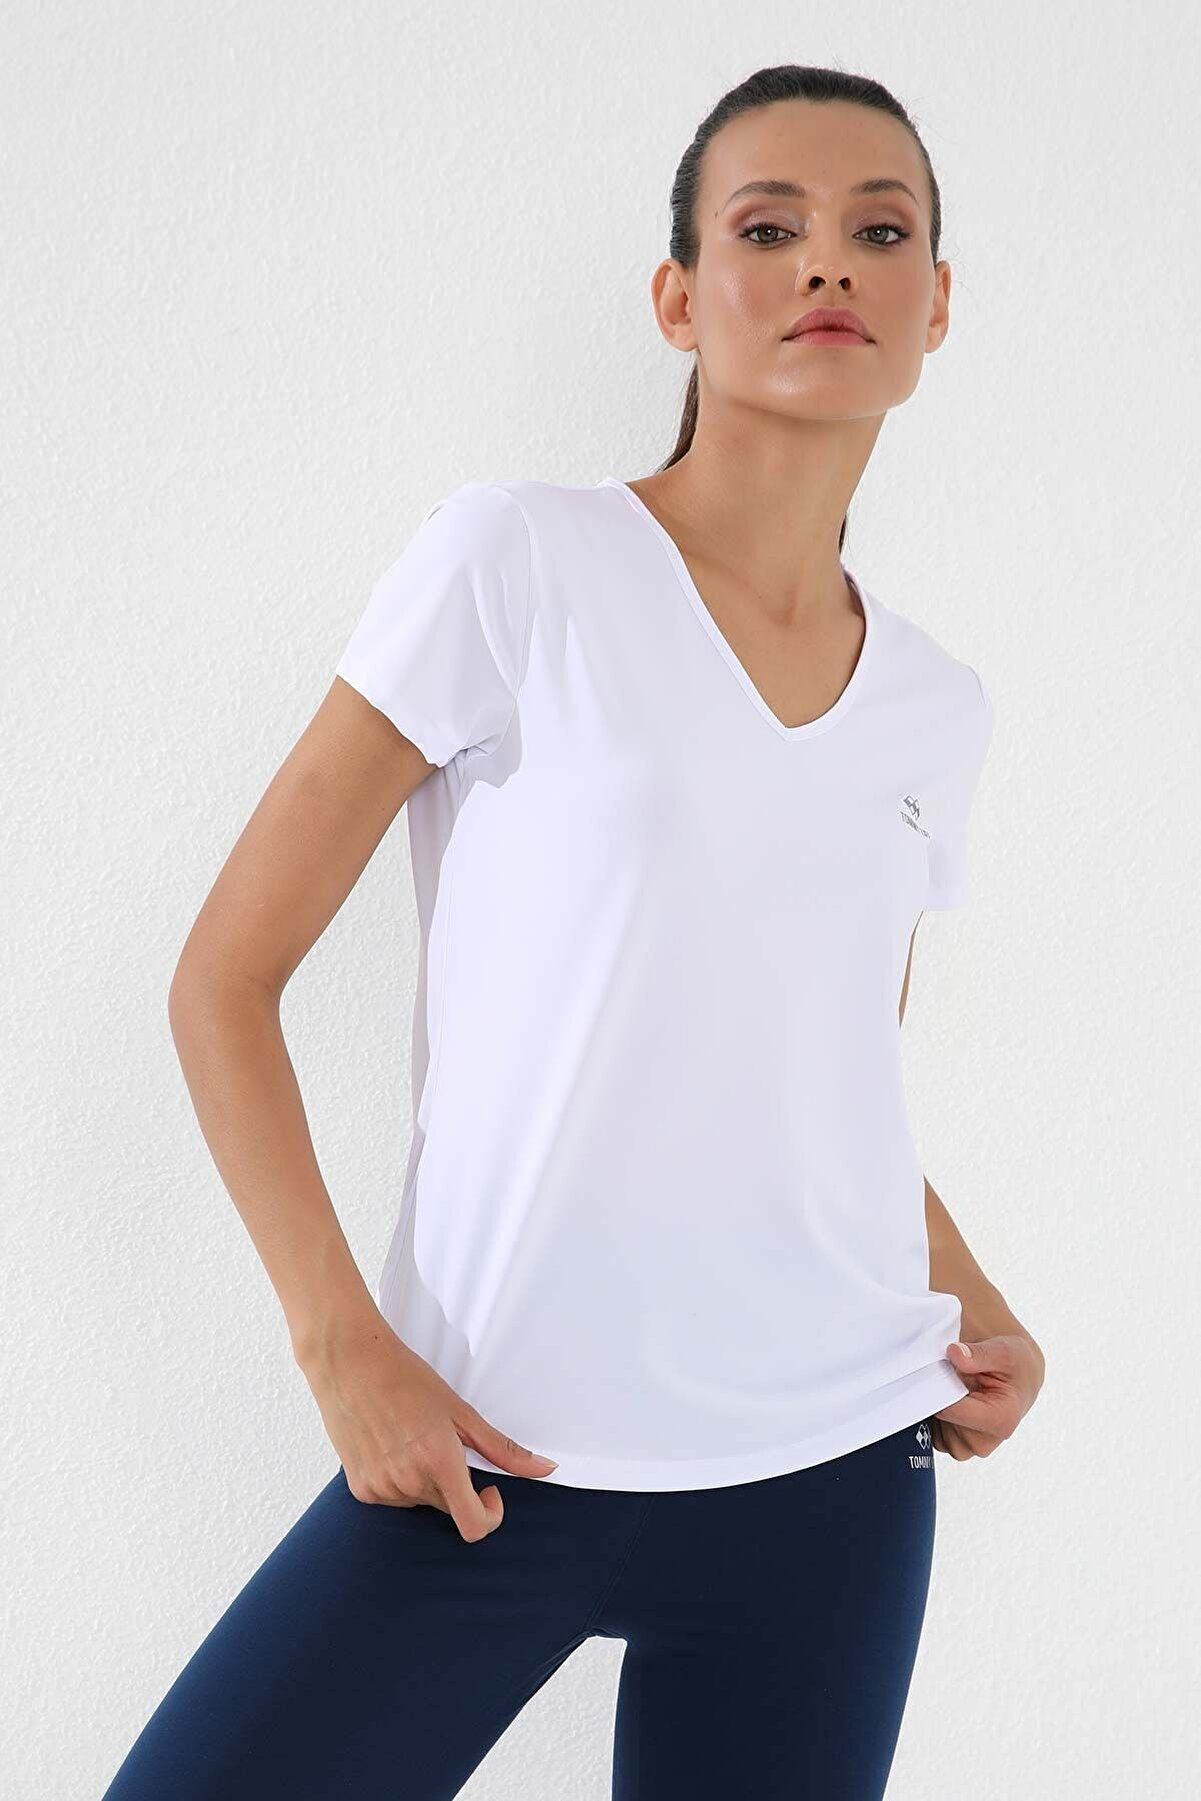 Tommy Life Beyaz Kadın Basic Kısa Kol Standart Kalıp V Yaka T-shirt - 97145